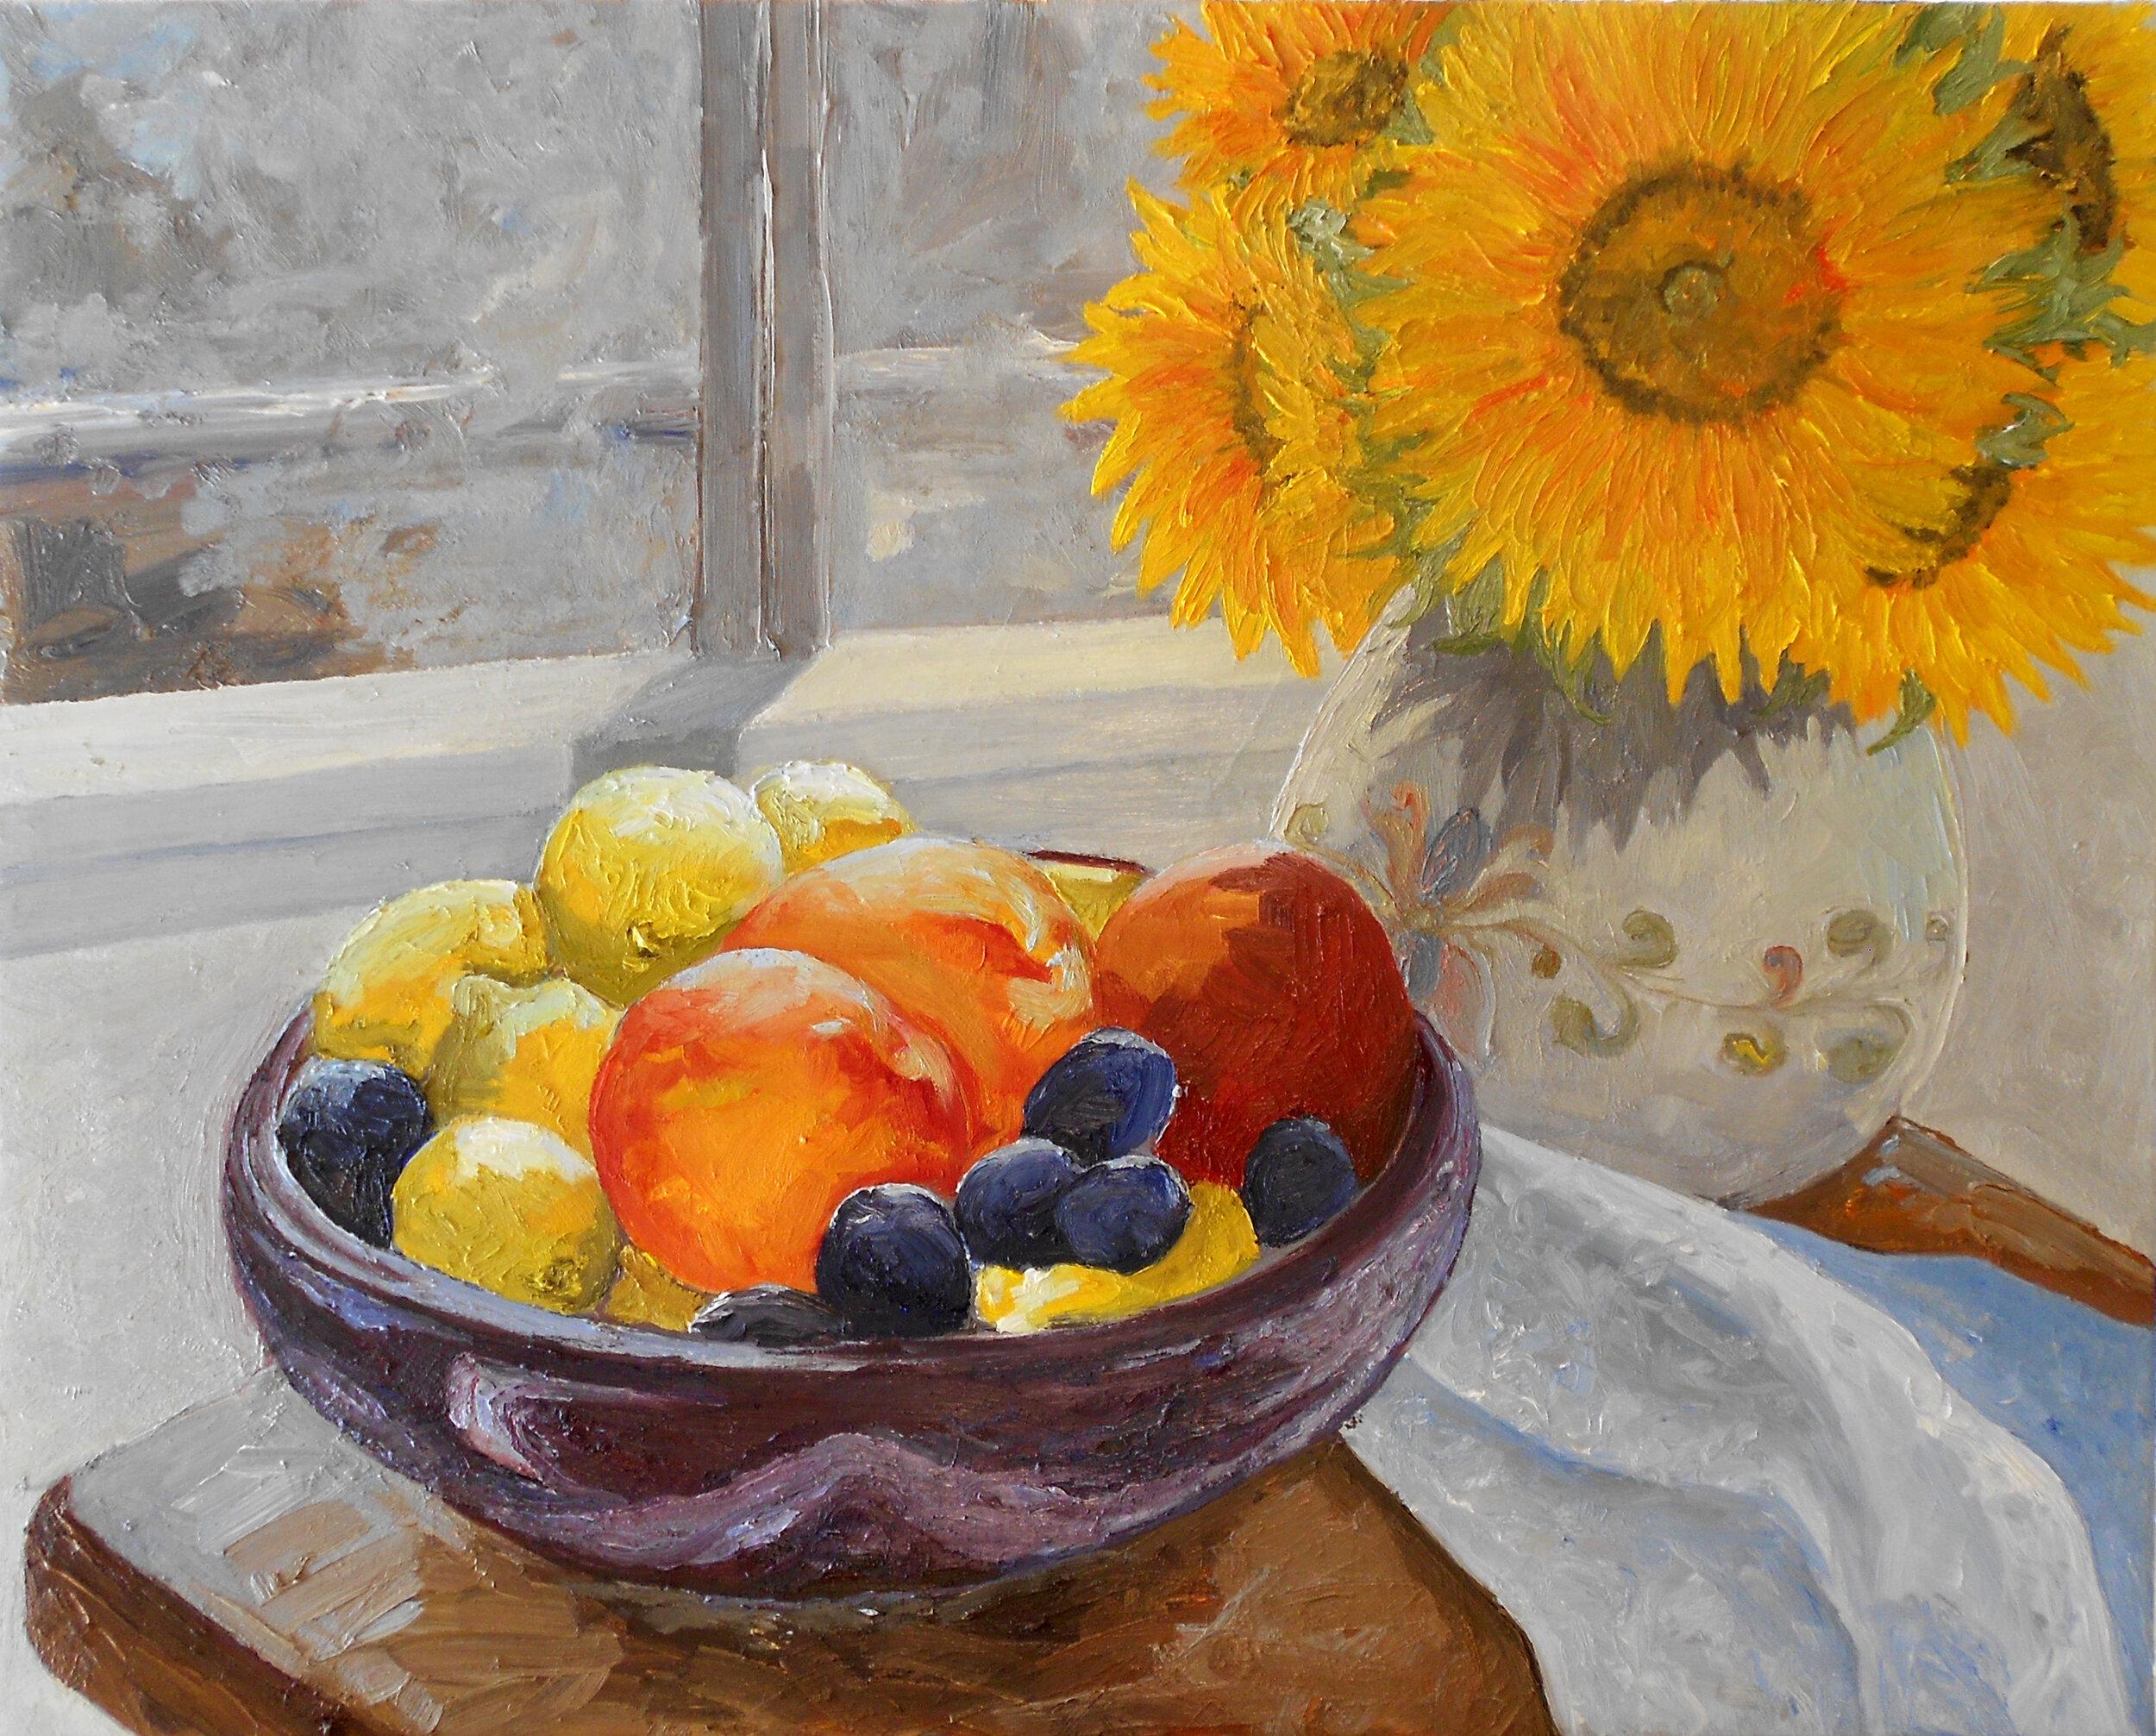 Stonefruit and Lemon